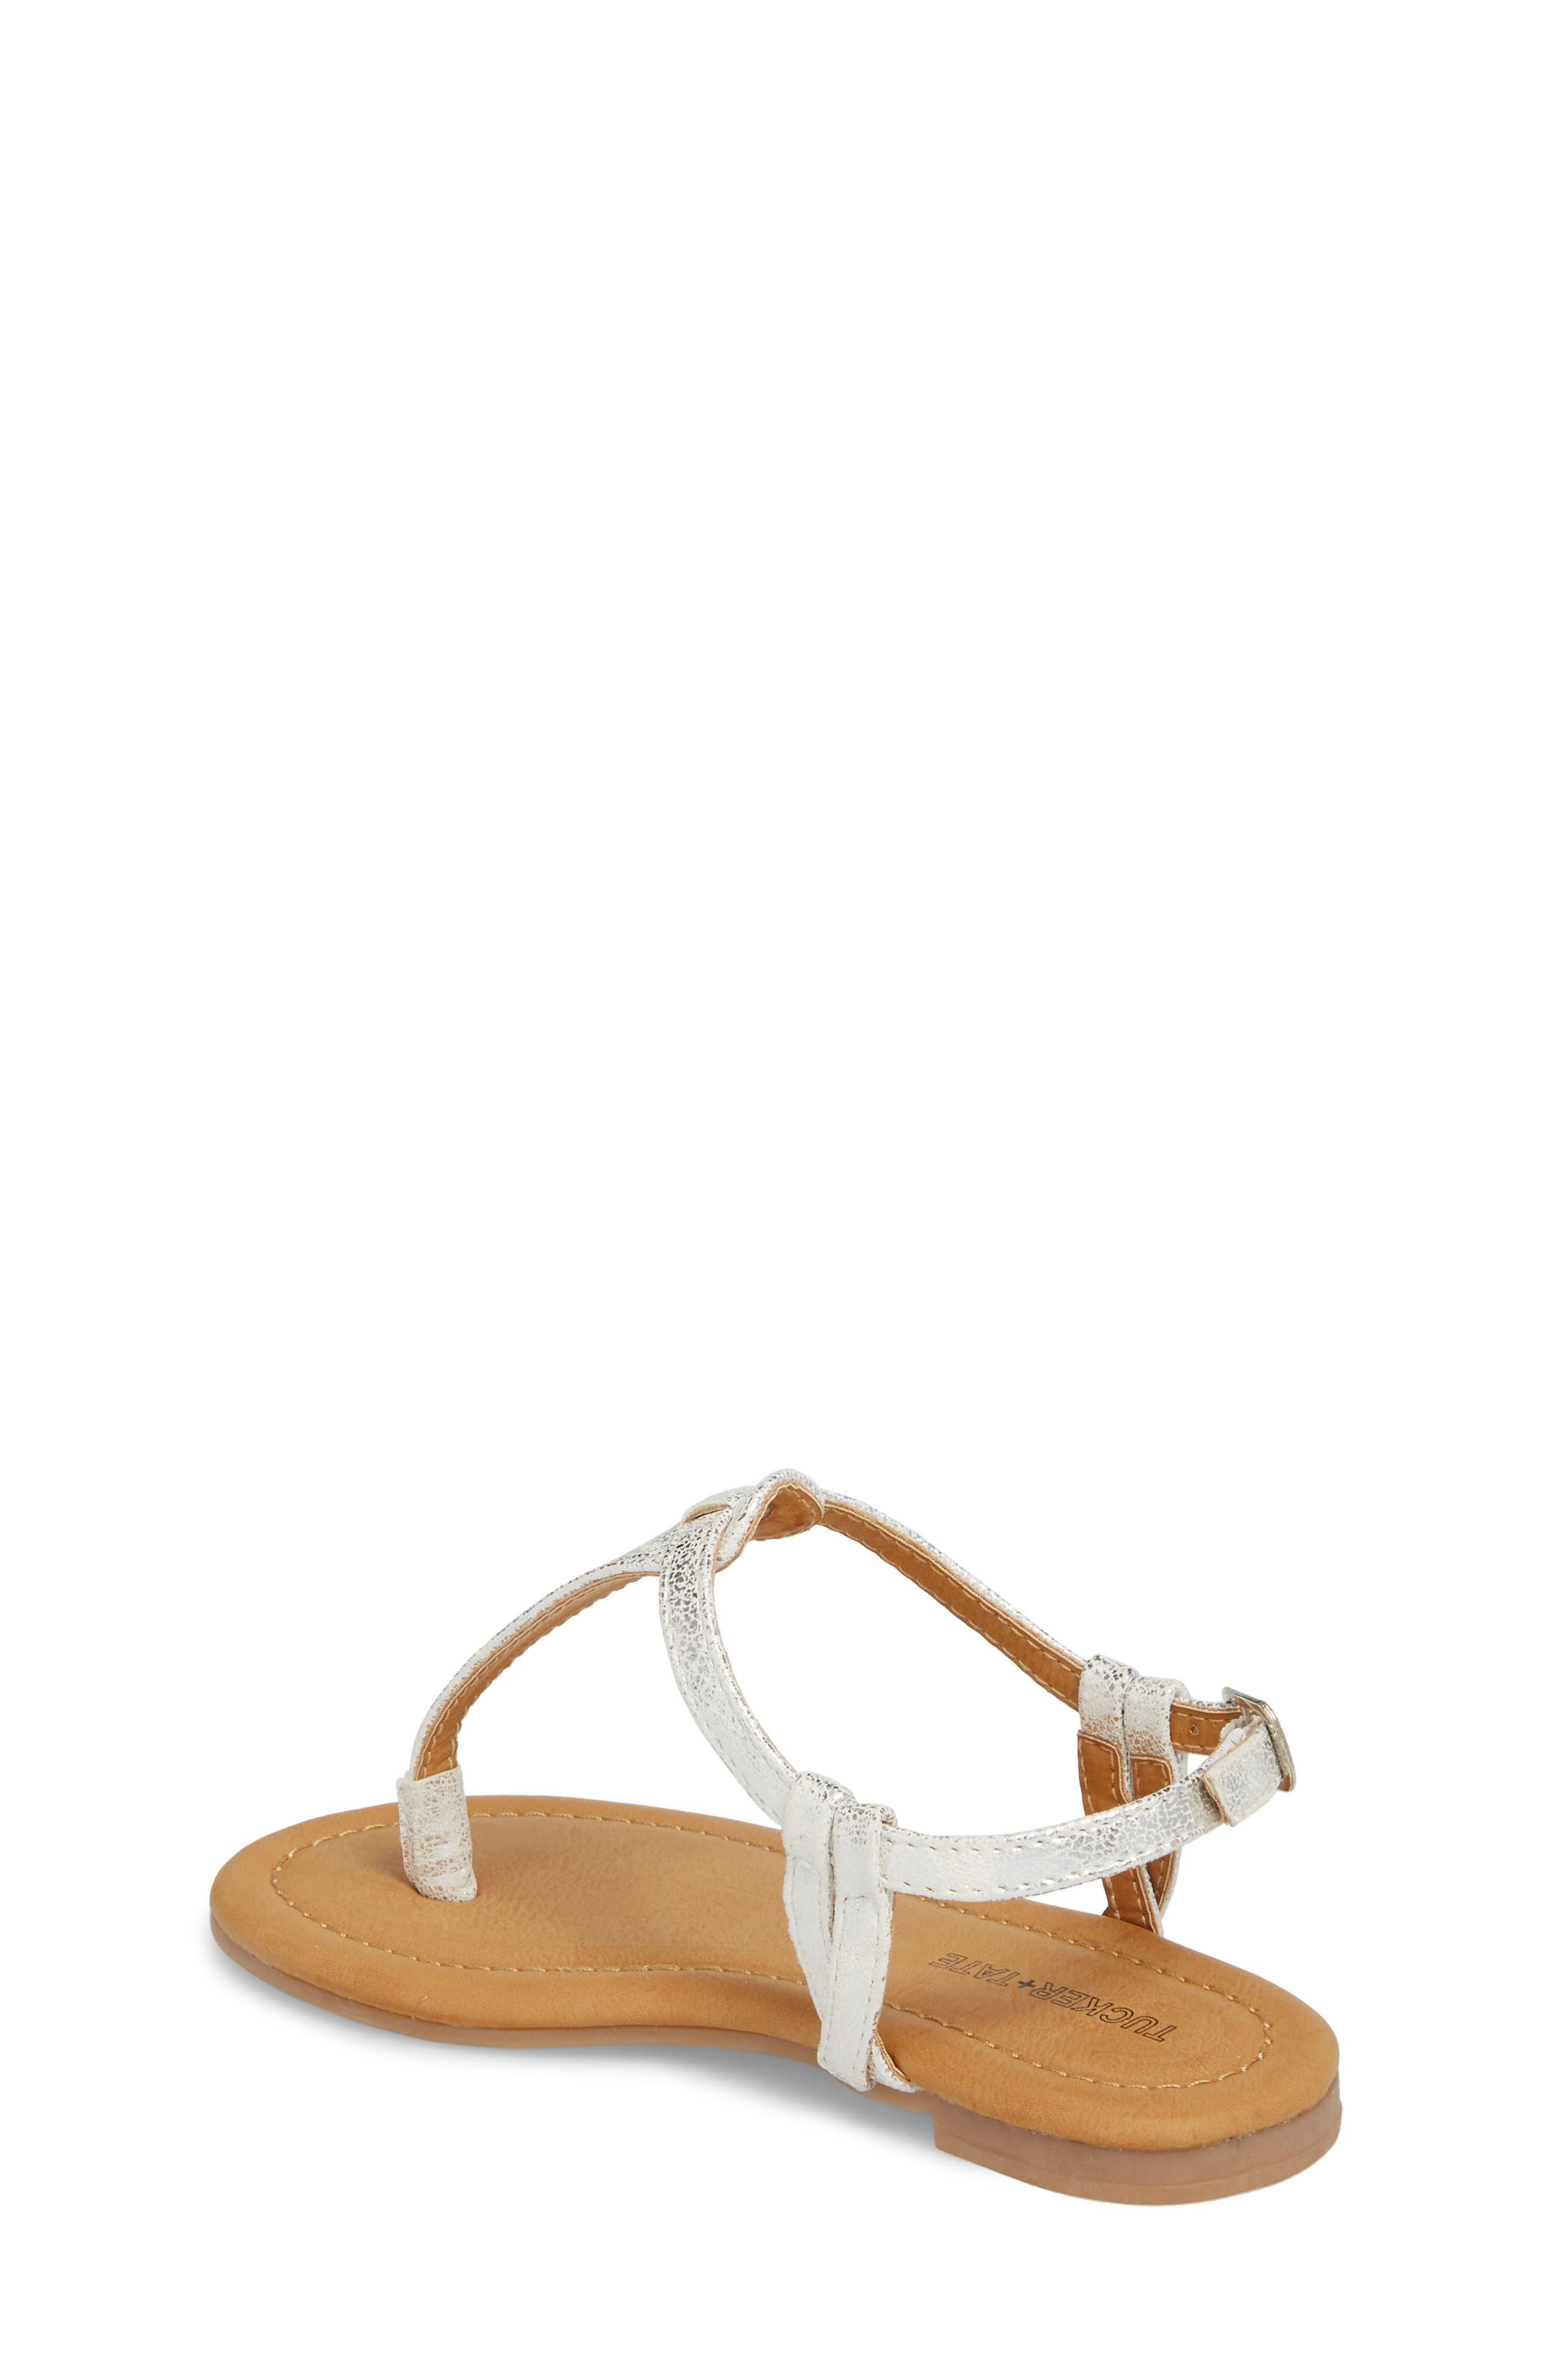 Lizzie Sandal,                             Alternate thumbnail 2, color,                             White/ Silver Faux Leather